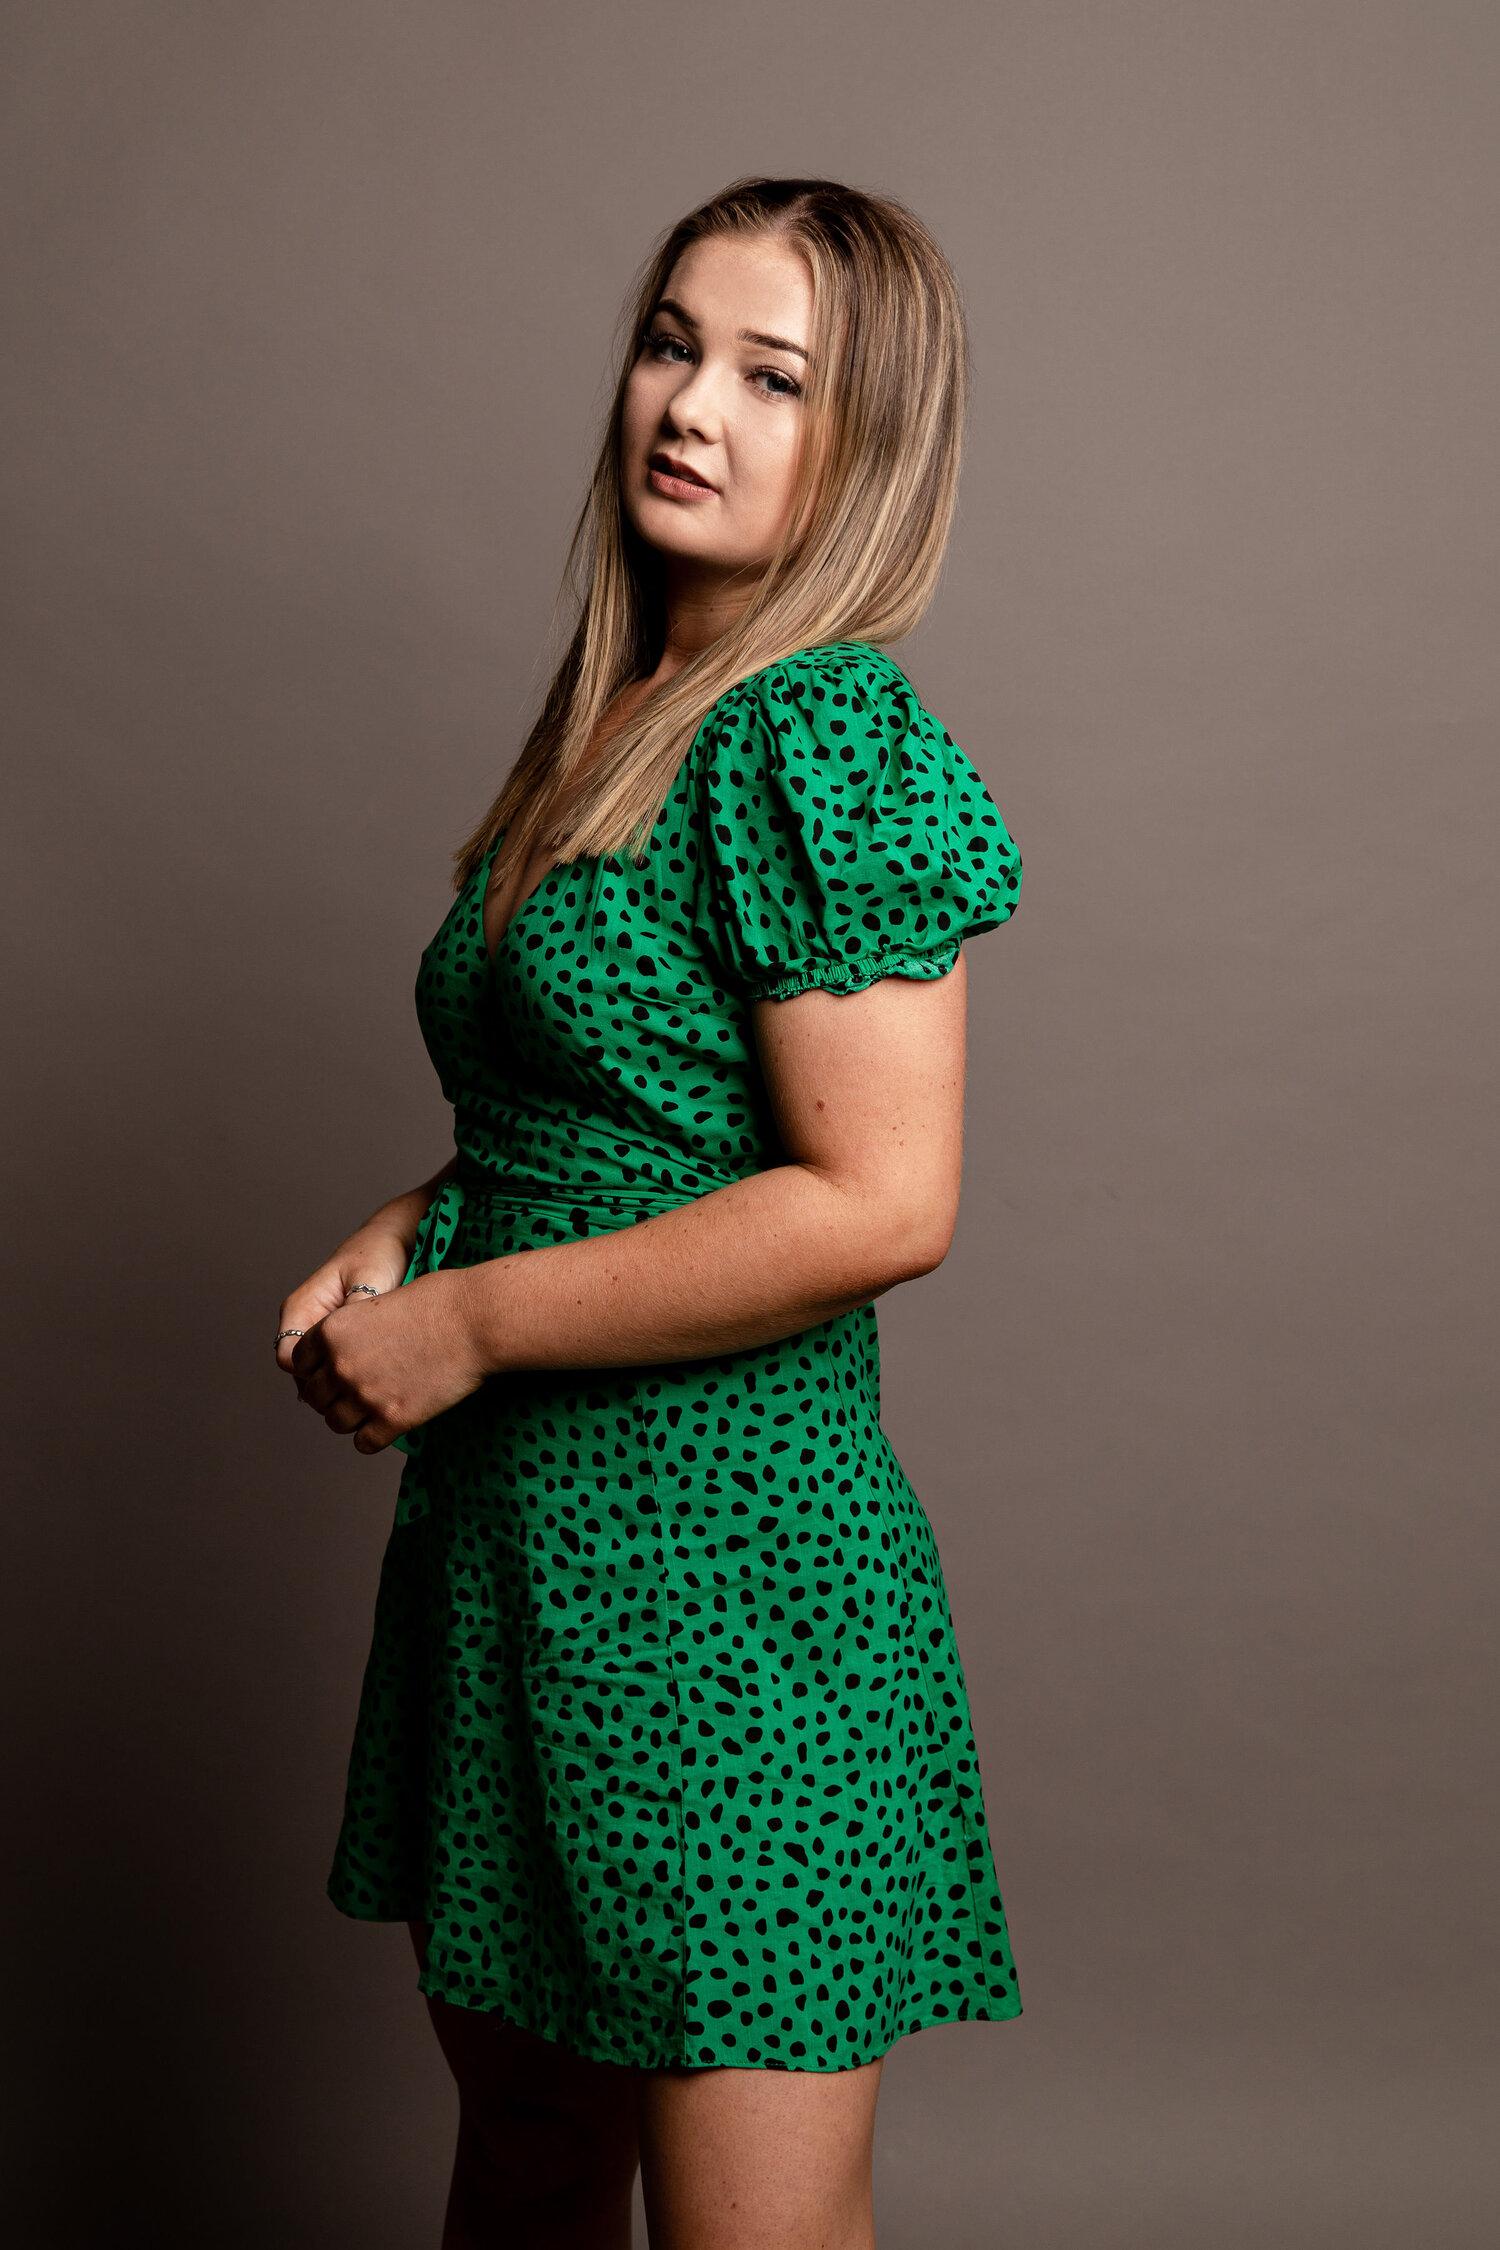 emma barrow photographer jade studio model fashion portfolio workshop portrait shoot